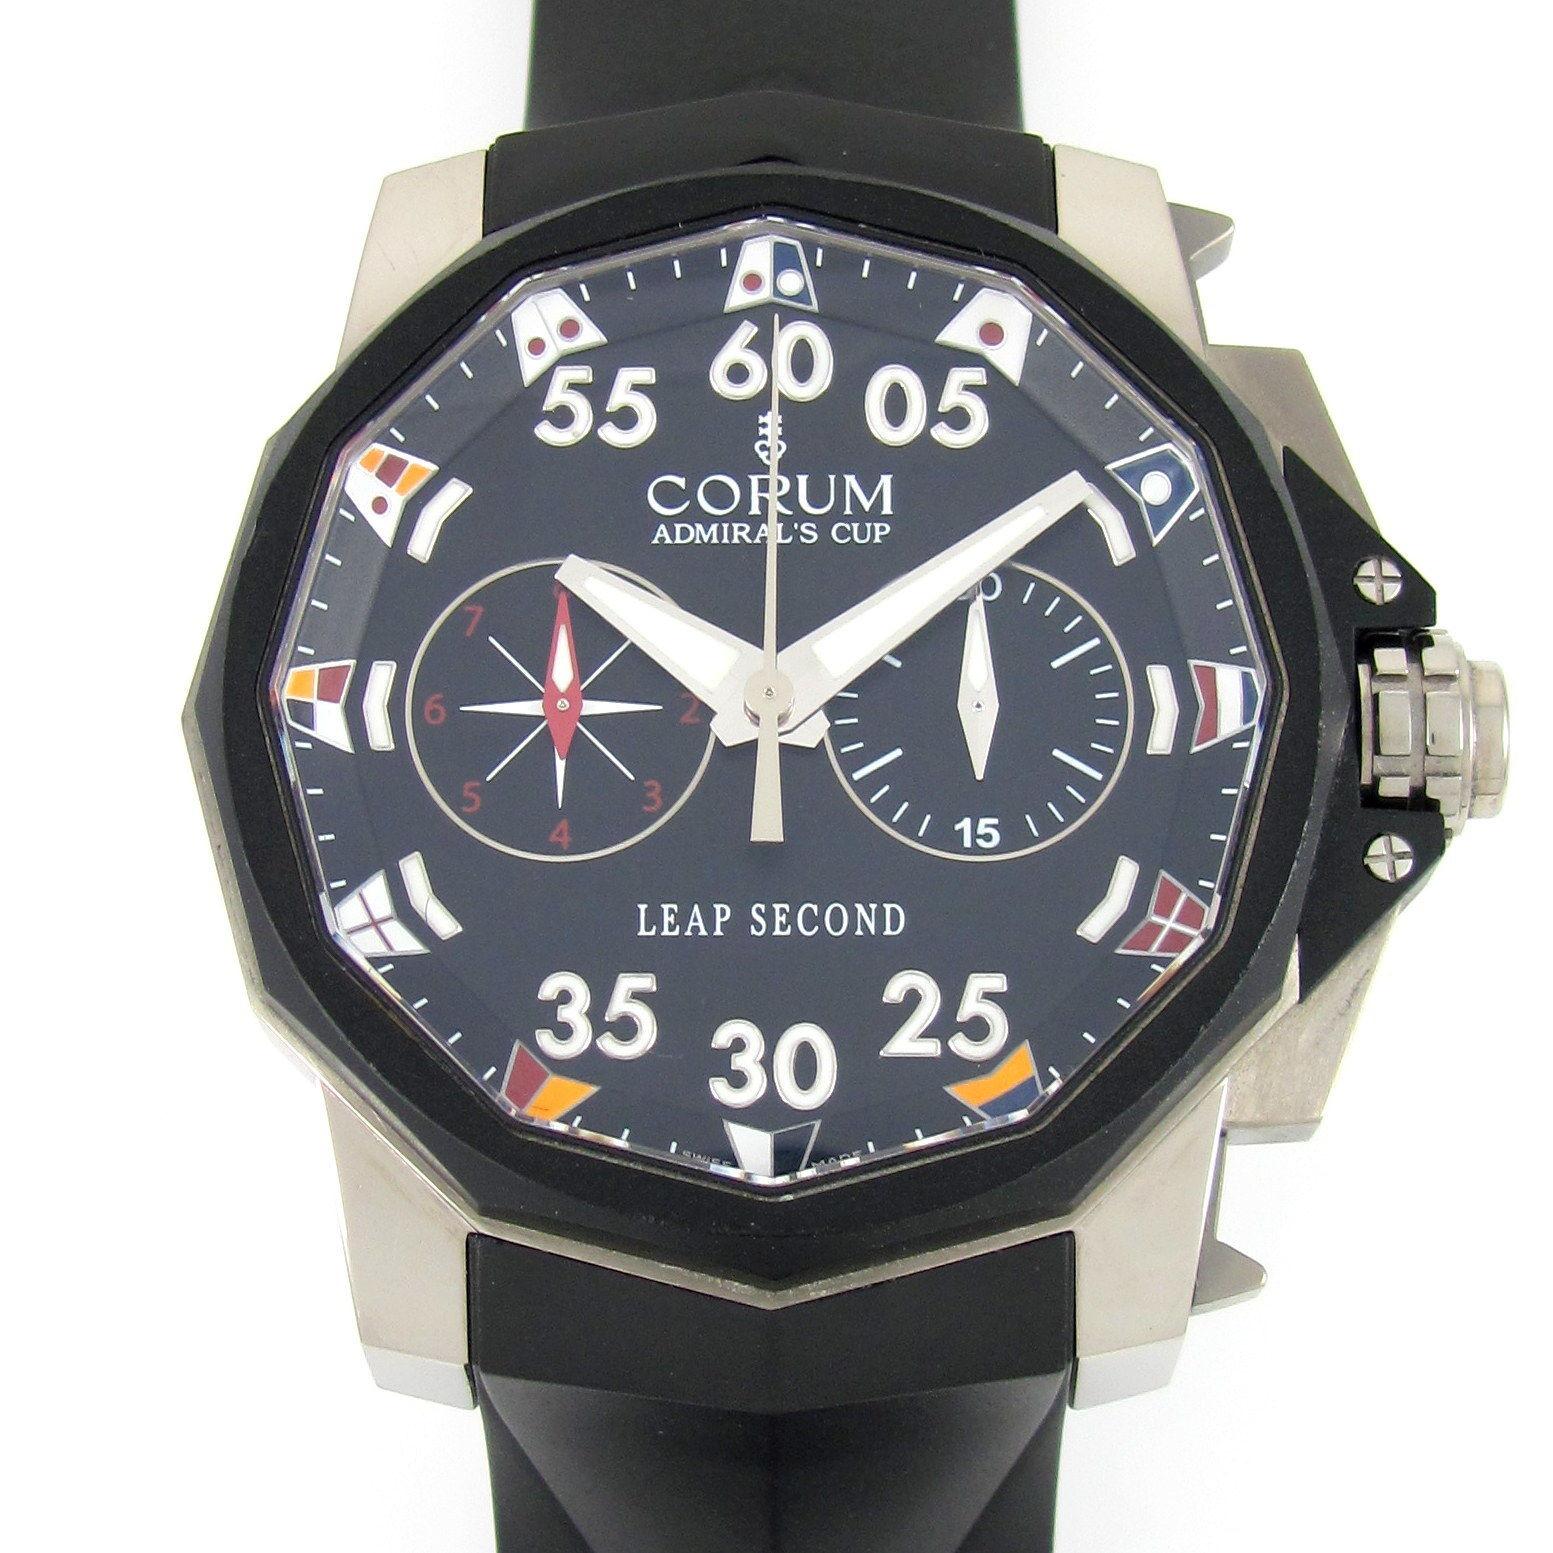 """""Corum Admirals Cup Titanium / Rubber 48mm Mens Watch"""""" 1136650"